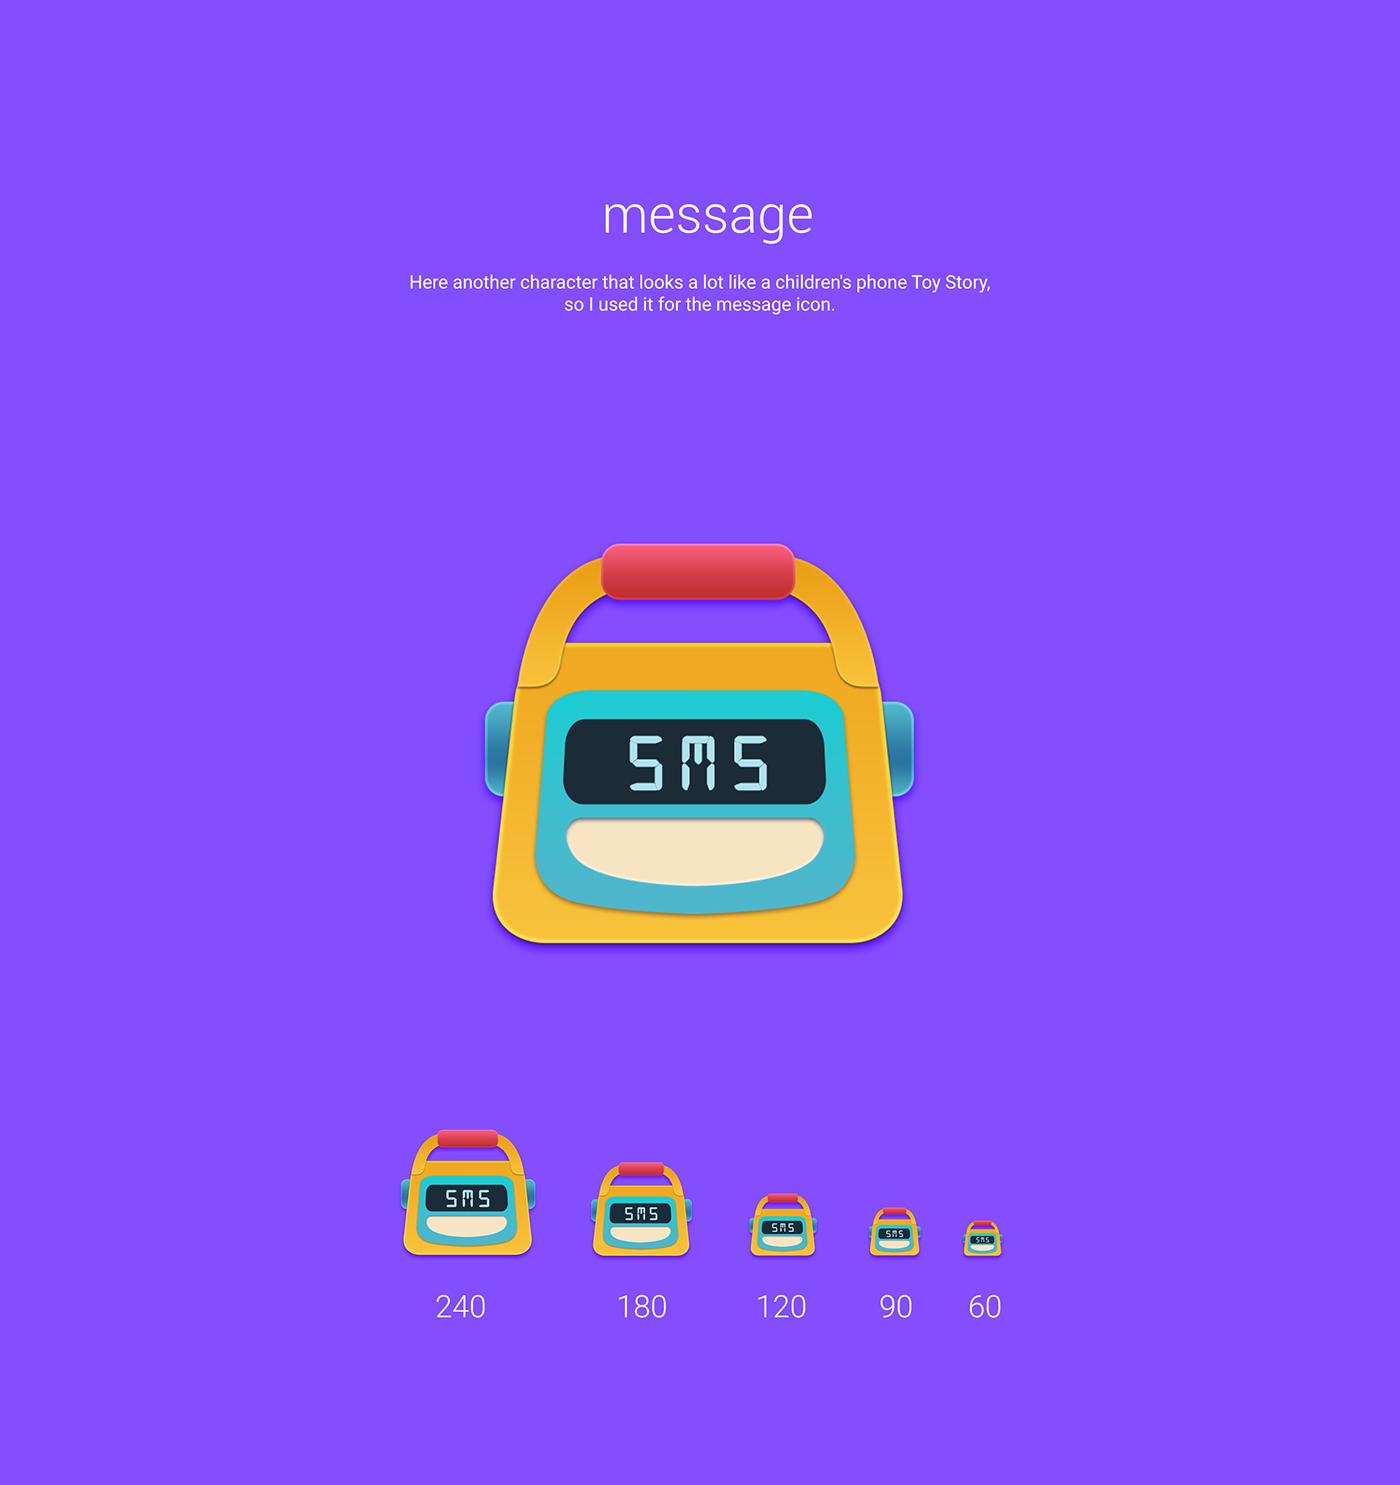 disney-pixar-toy-story-android-icons-leo-natsume-05